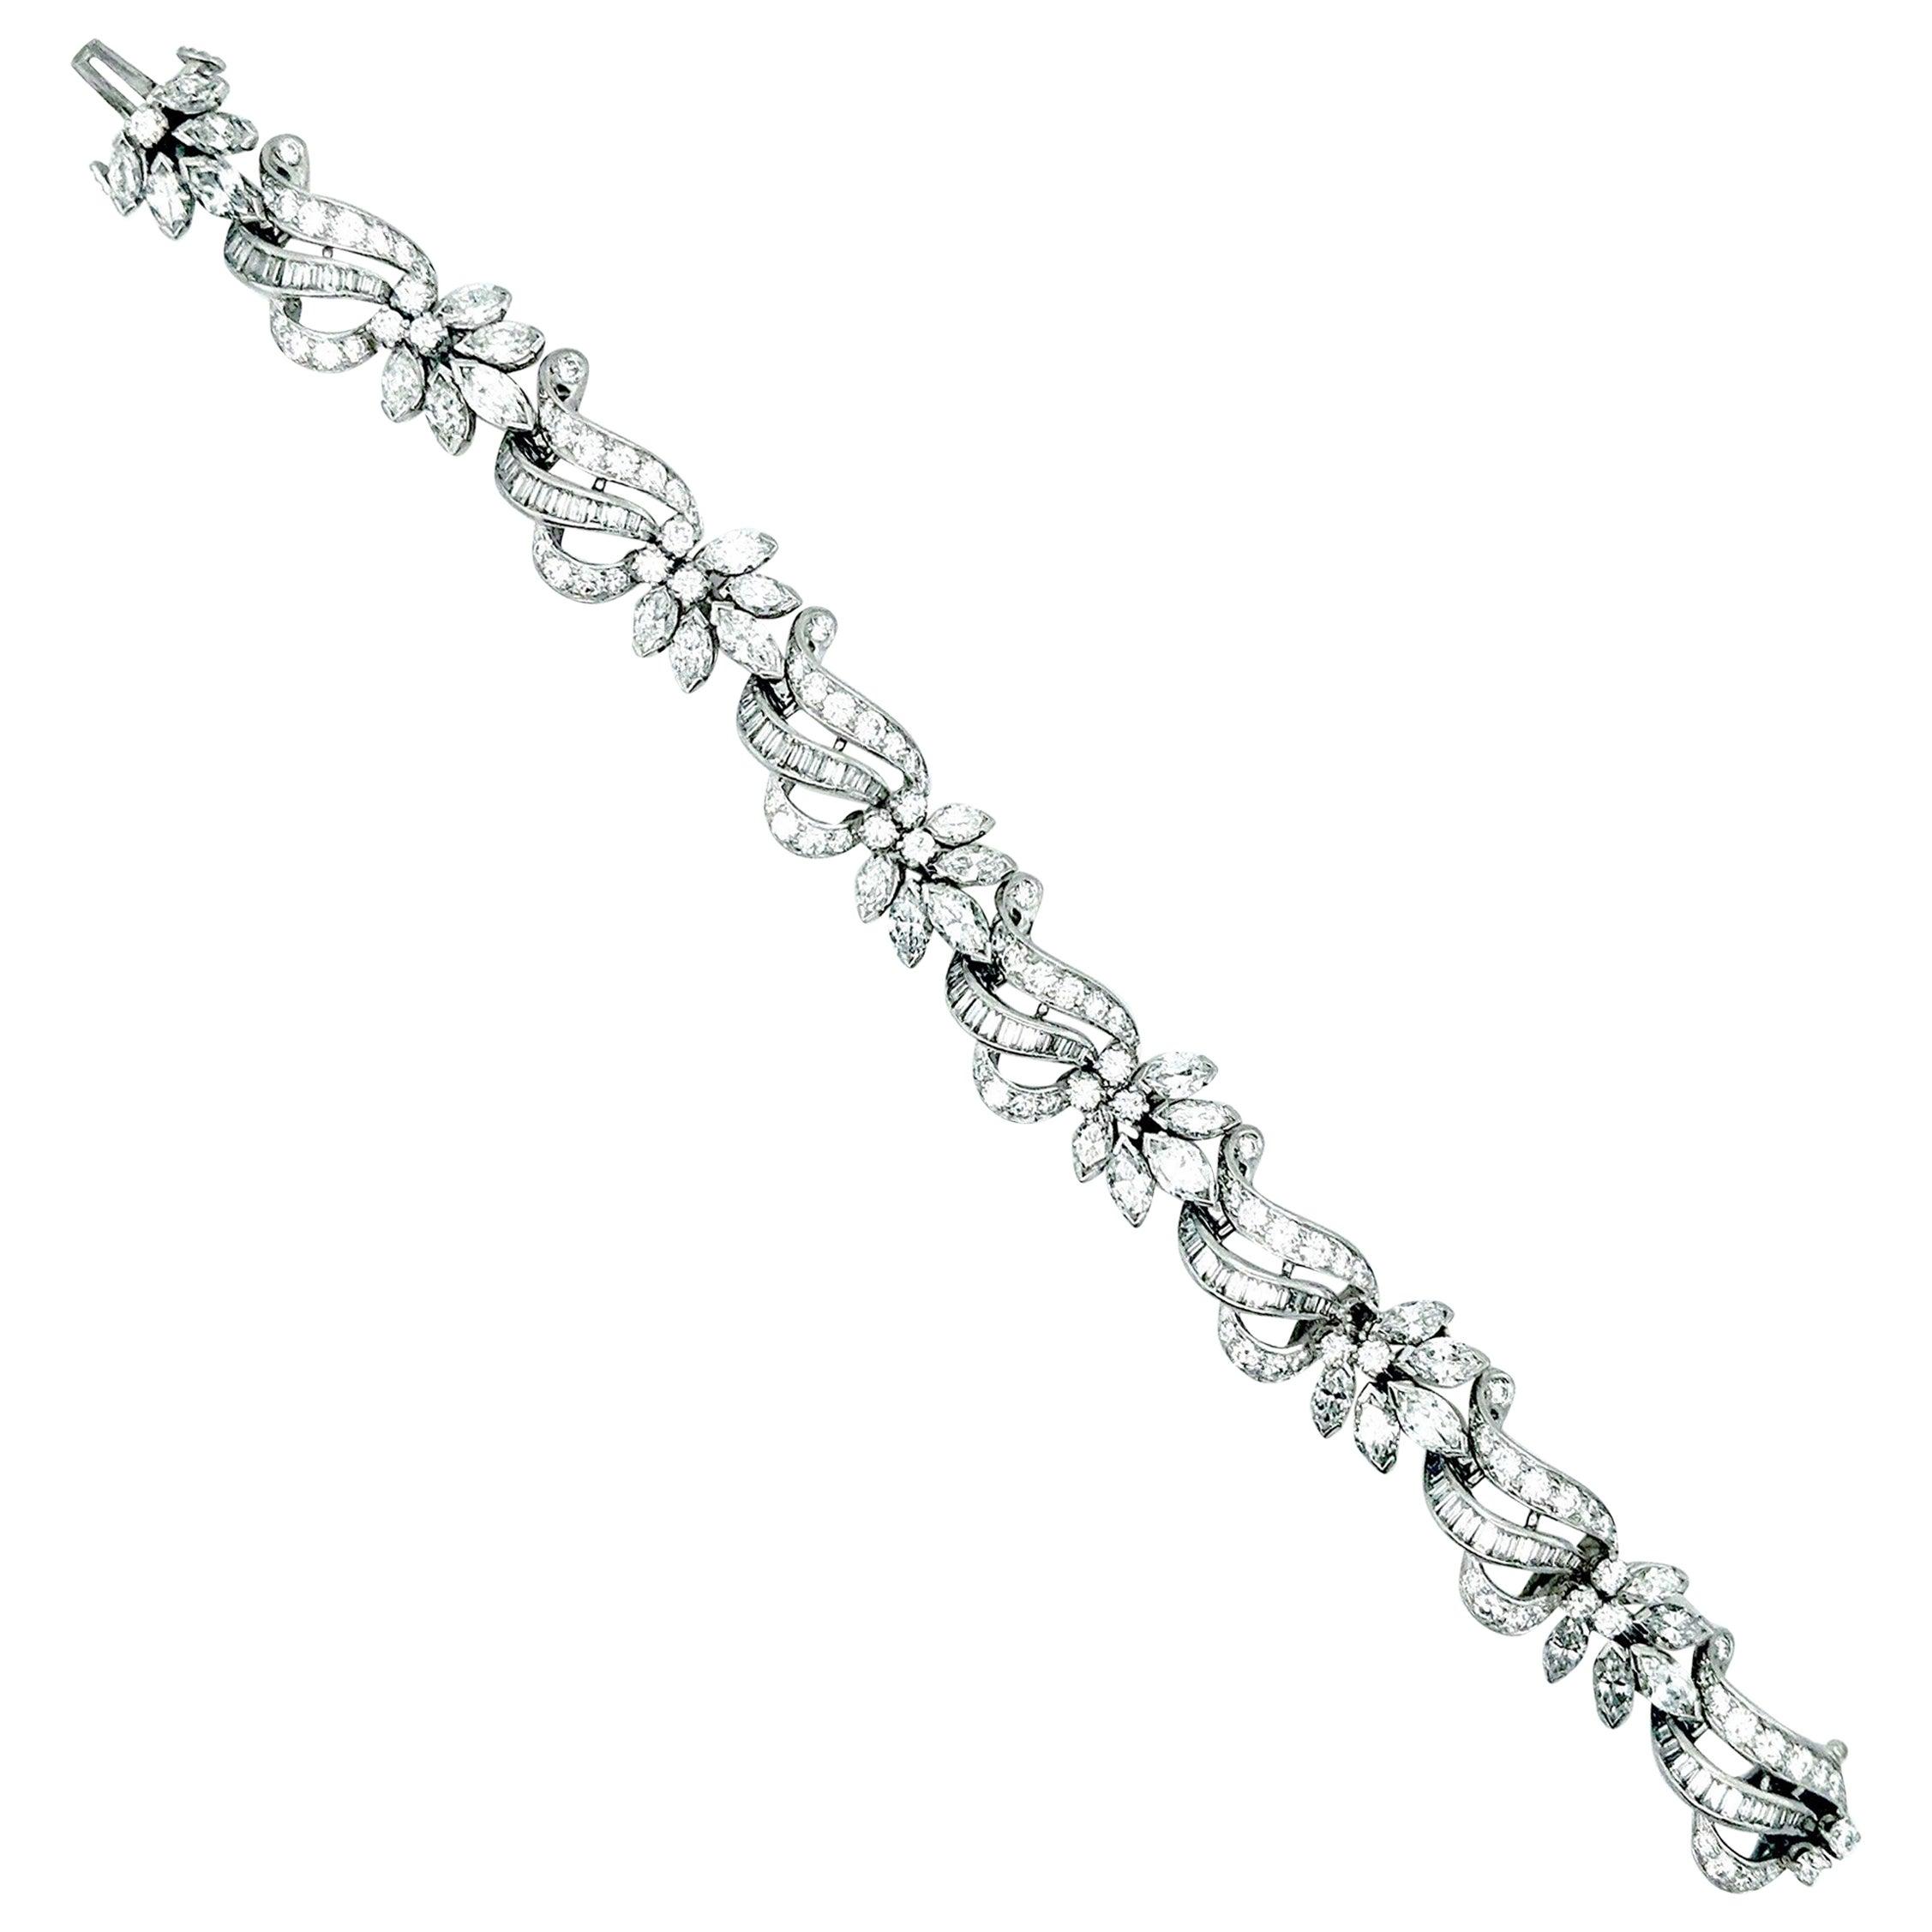 Diamond Bracelet, circa 1960s